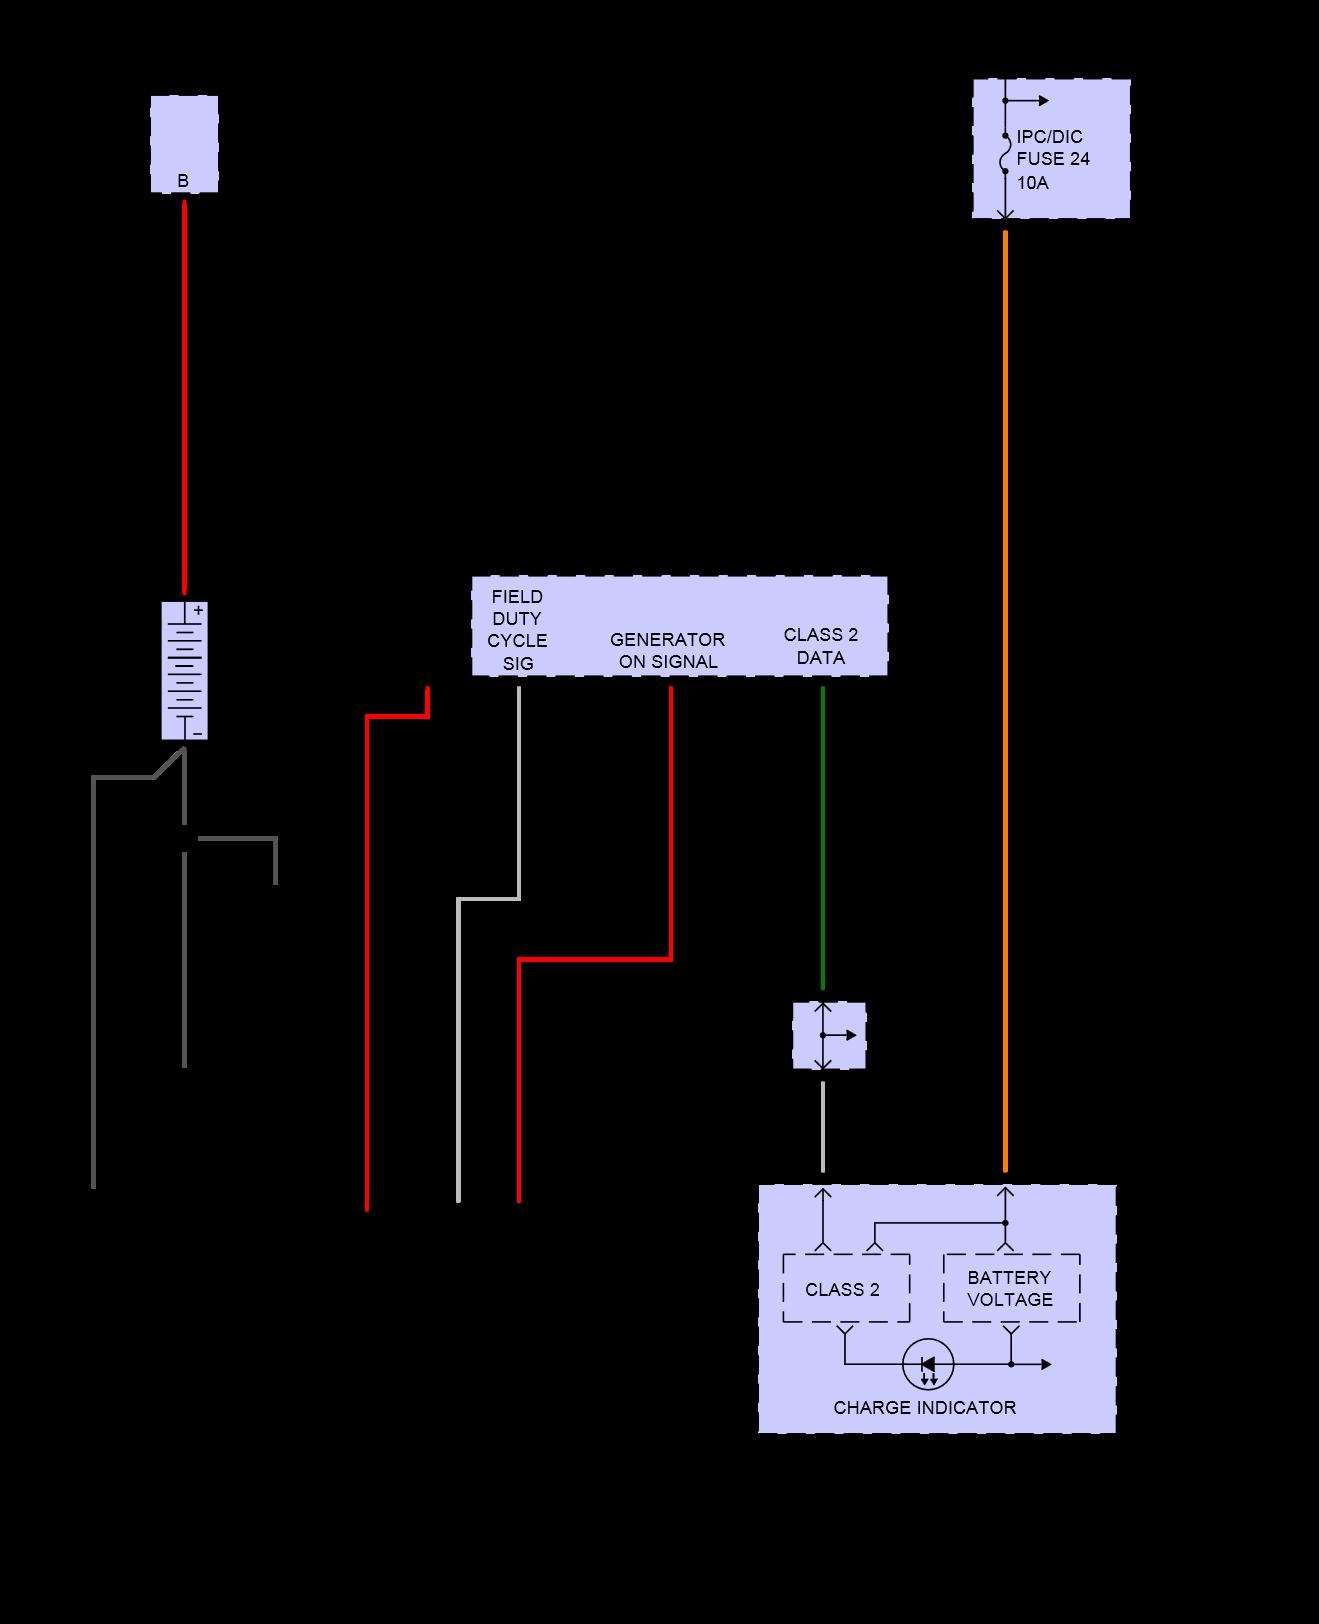 [DIAGRAM_3ER]  GV_7446] 2002 Chevy Trailblazer Engine Diagram Schematic Wiring | 2008 Chevy Trailblazer Engine Diagram |  | Ophag Joni Wiluq Isop Ructi Terch Loida Kicep Mohammedshrine Librar Wiring  101